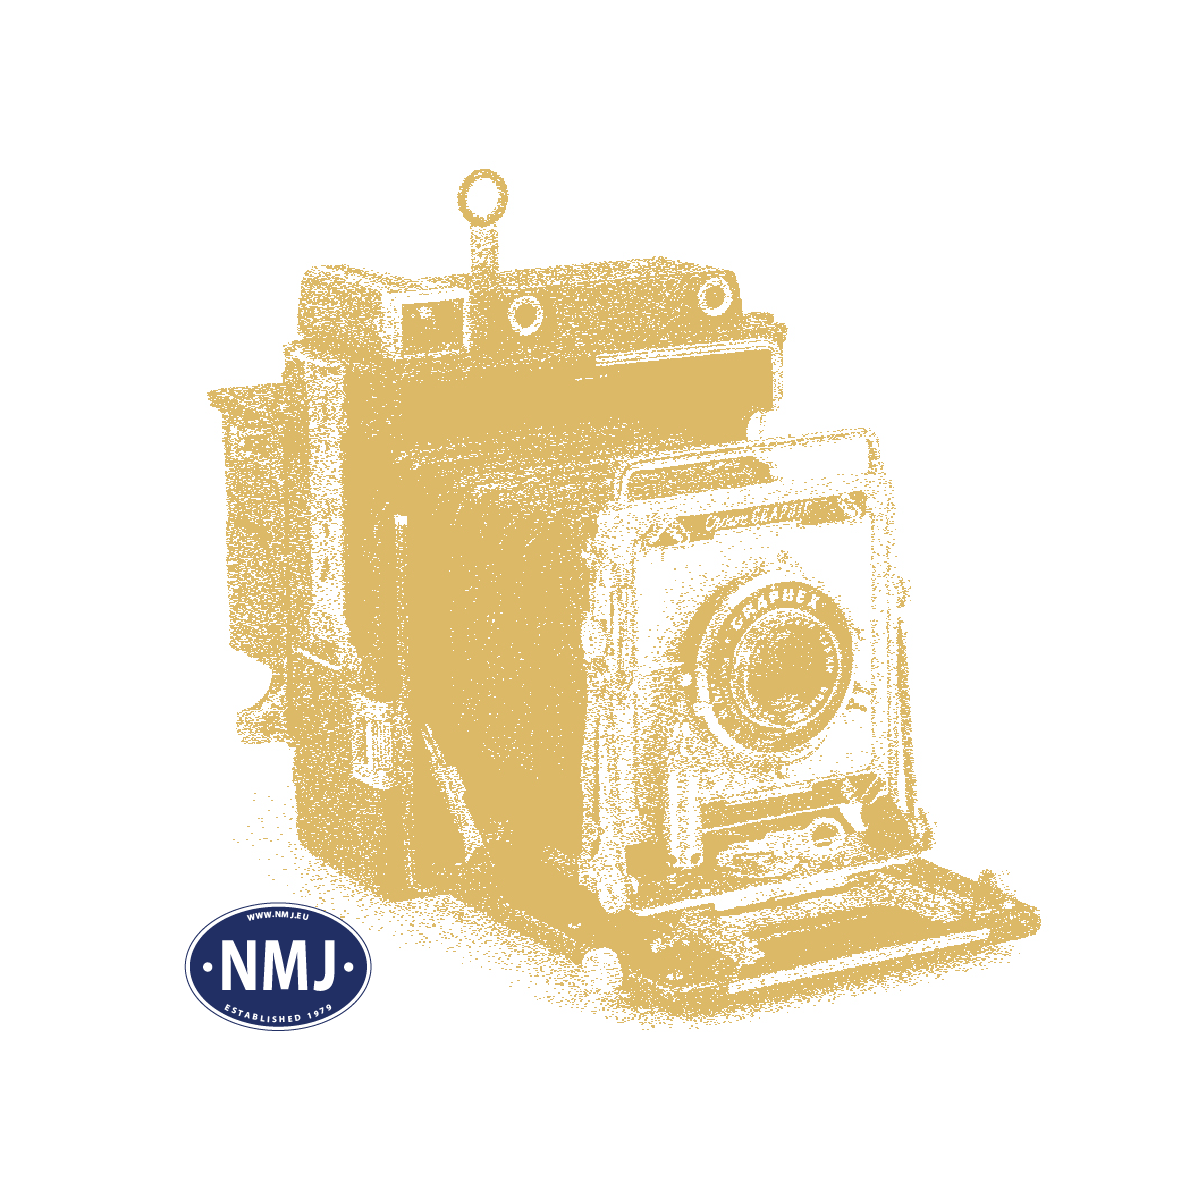 MBR55-1018 - Gressmatte #18, 30 x 40 Cm